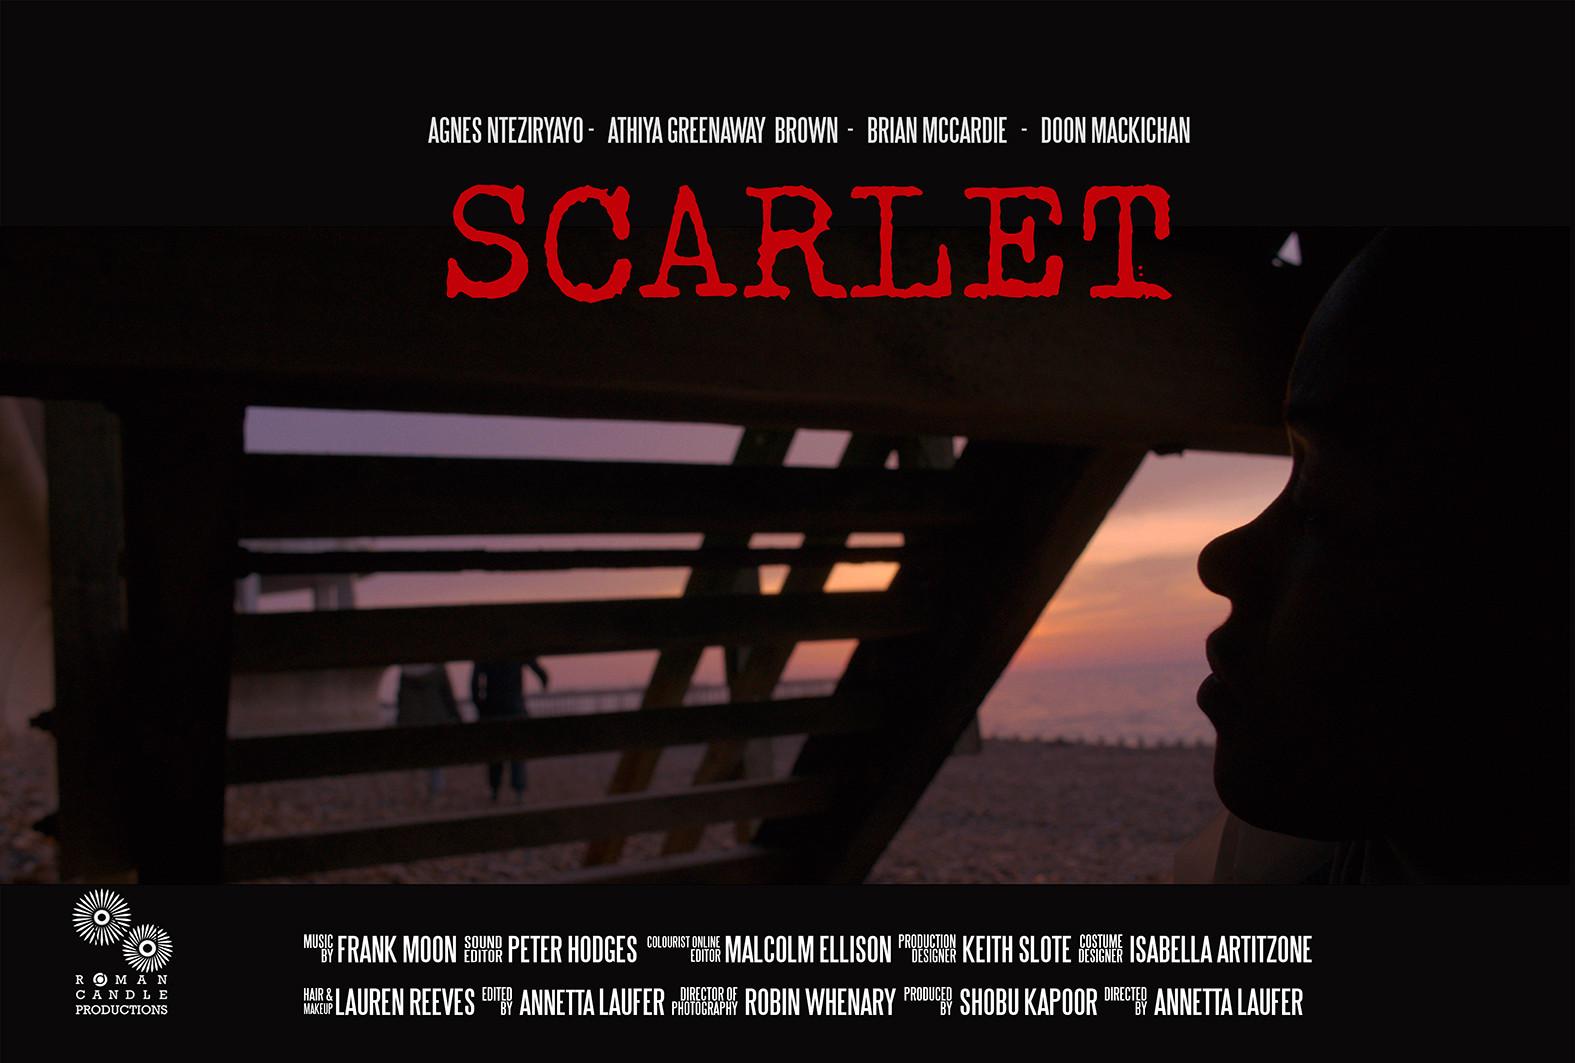 scarlet_filmposter40x27_100ppi_23sept17.